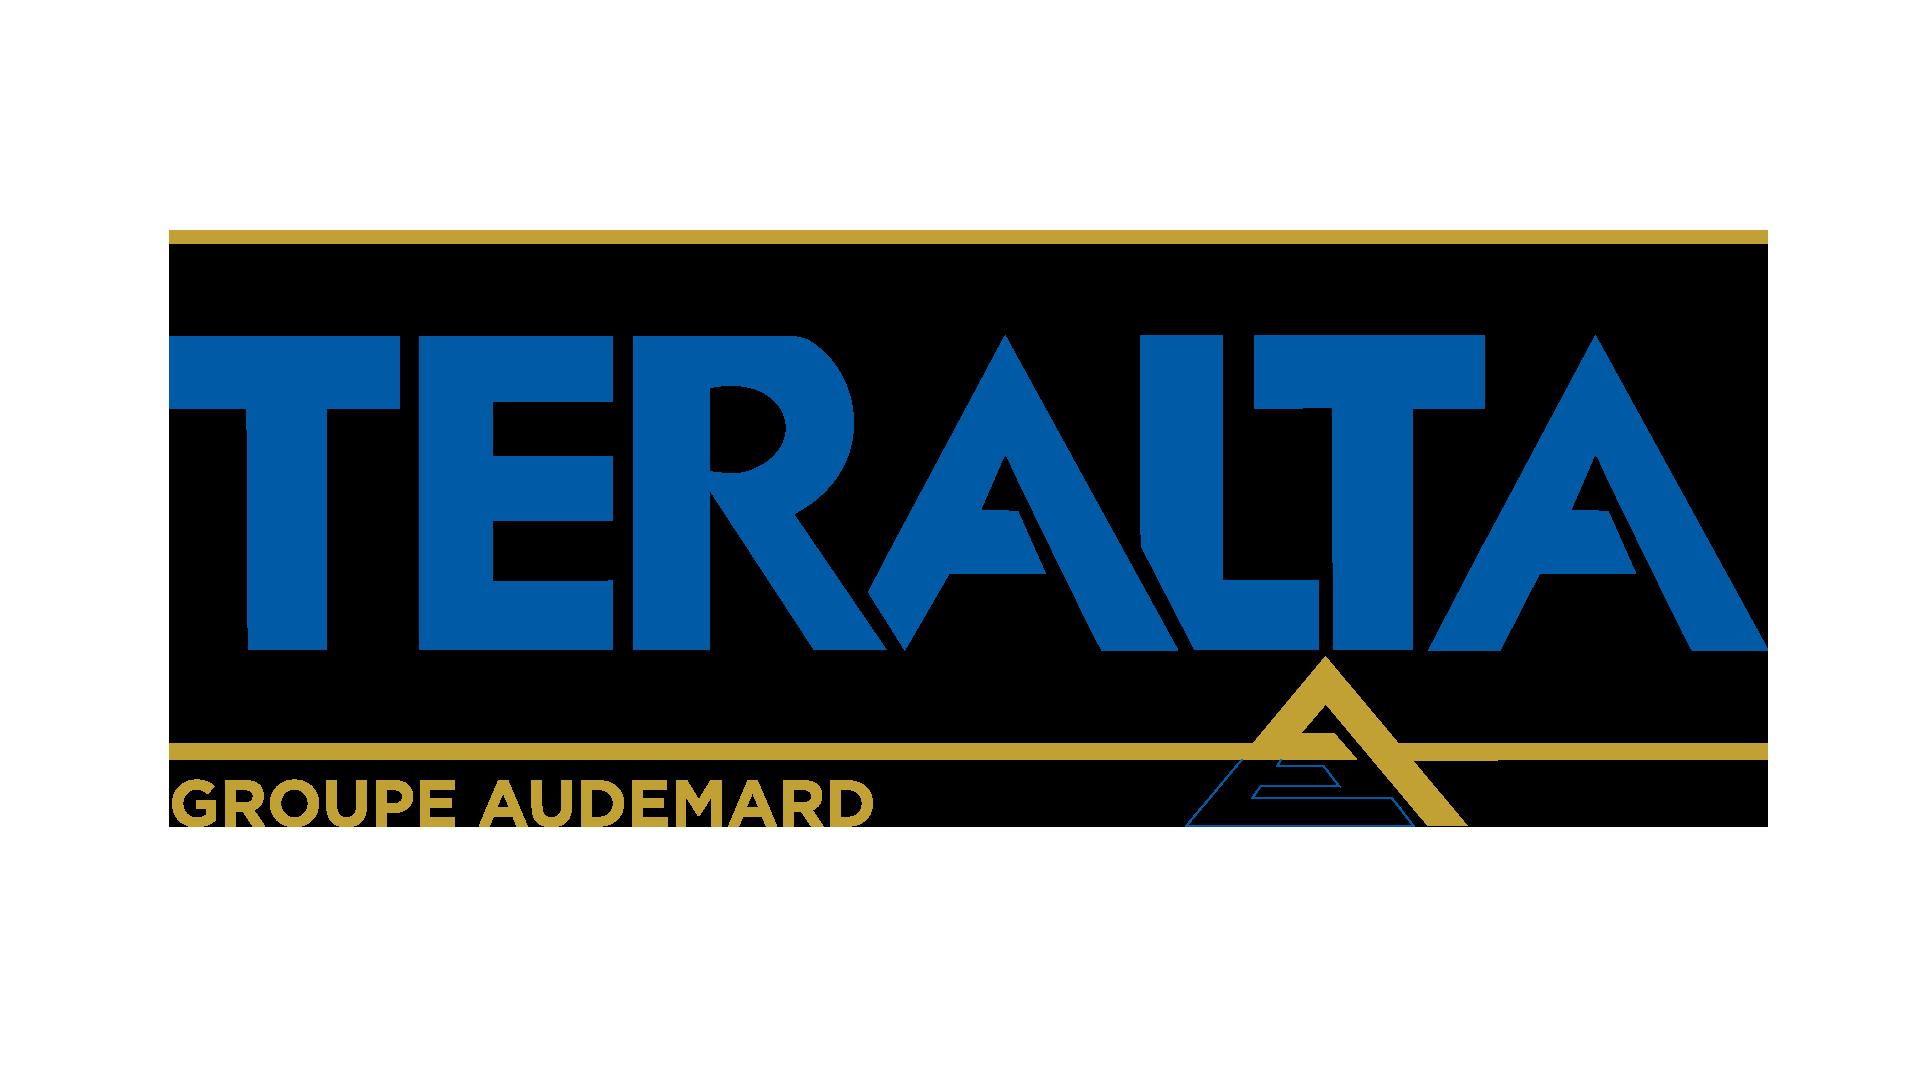 teralta-groupe-crh-logo